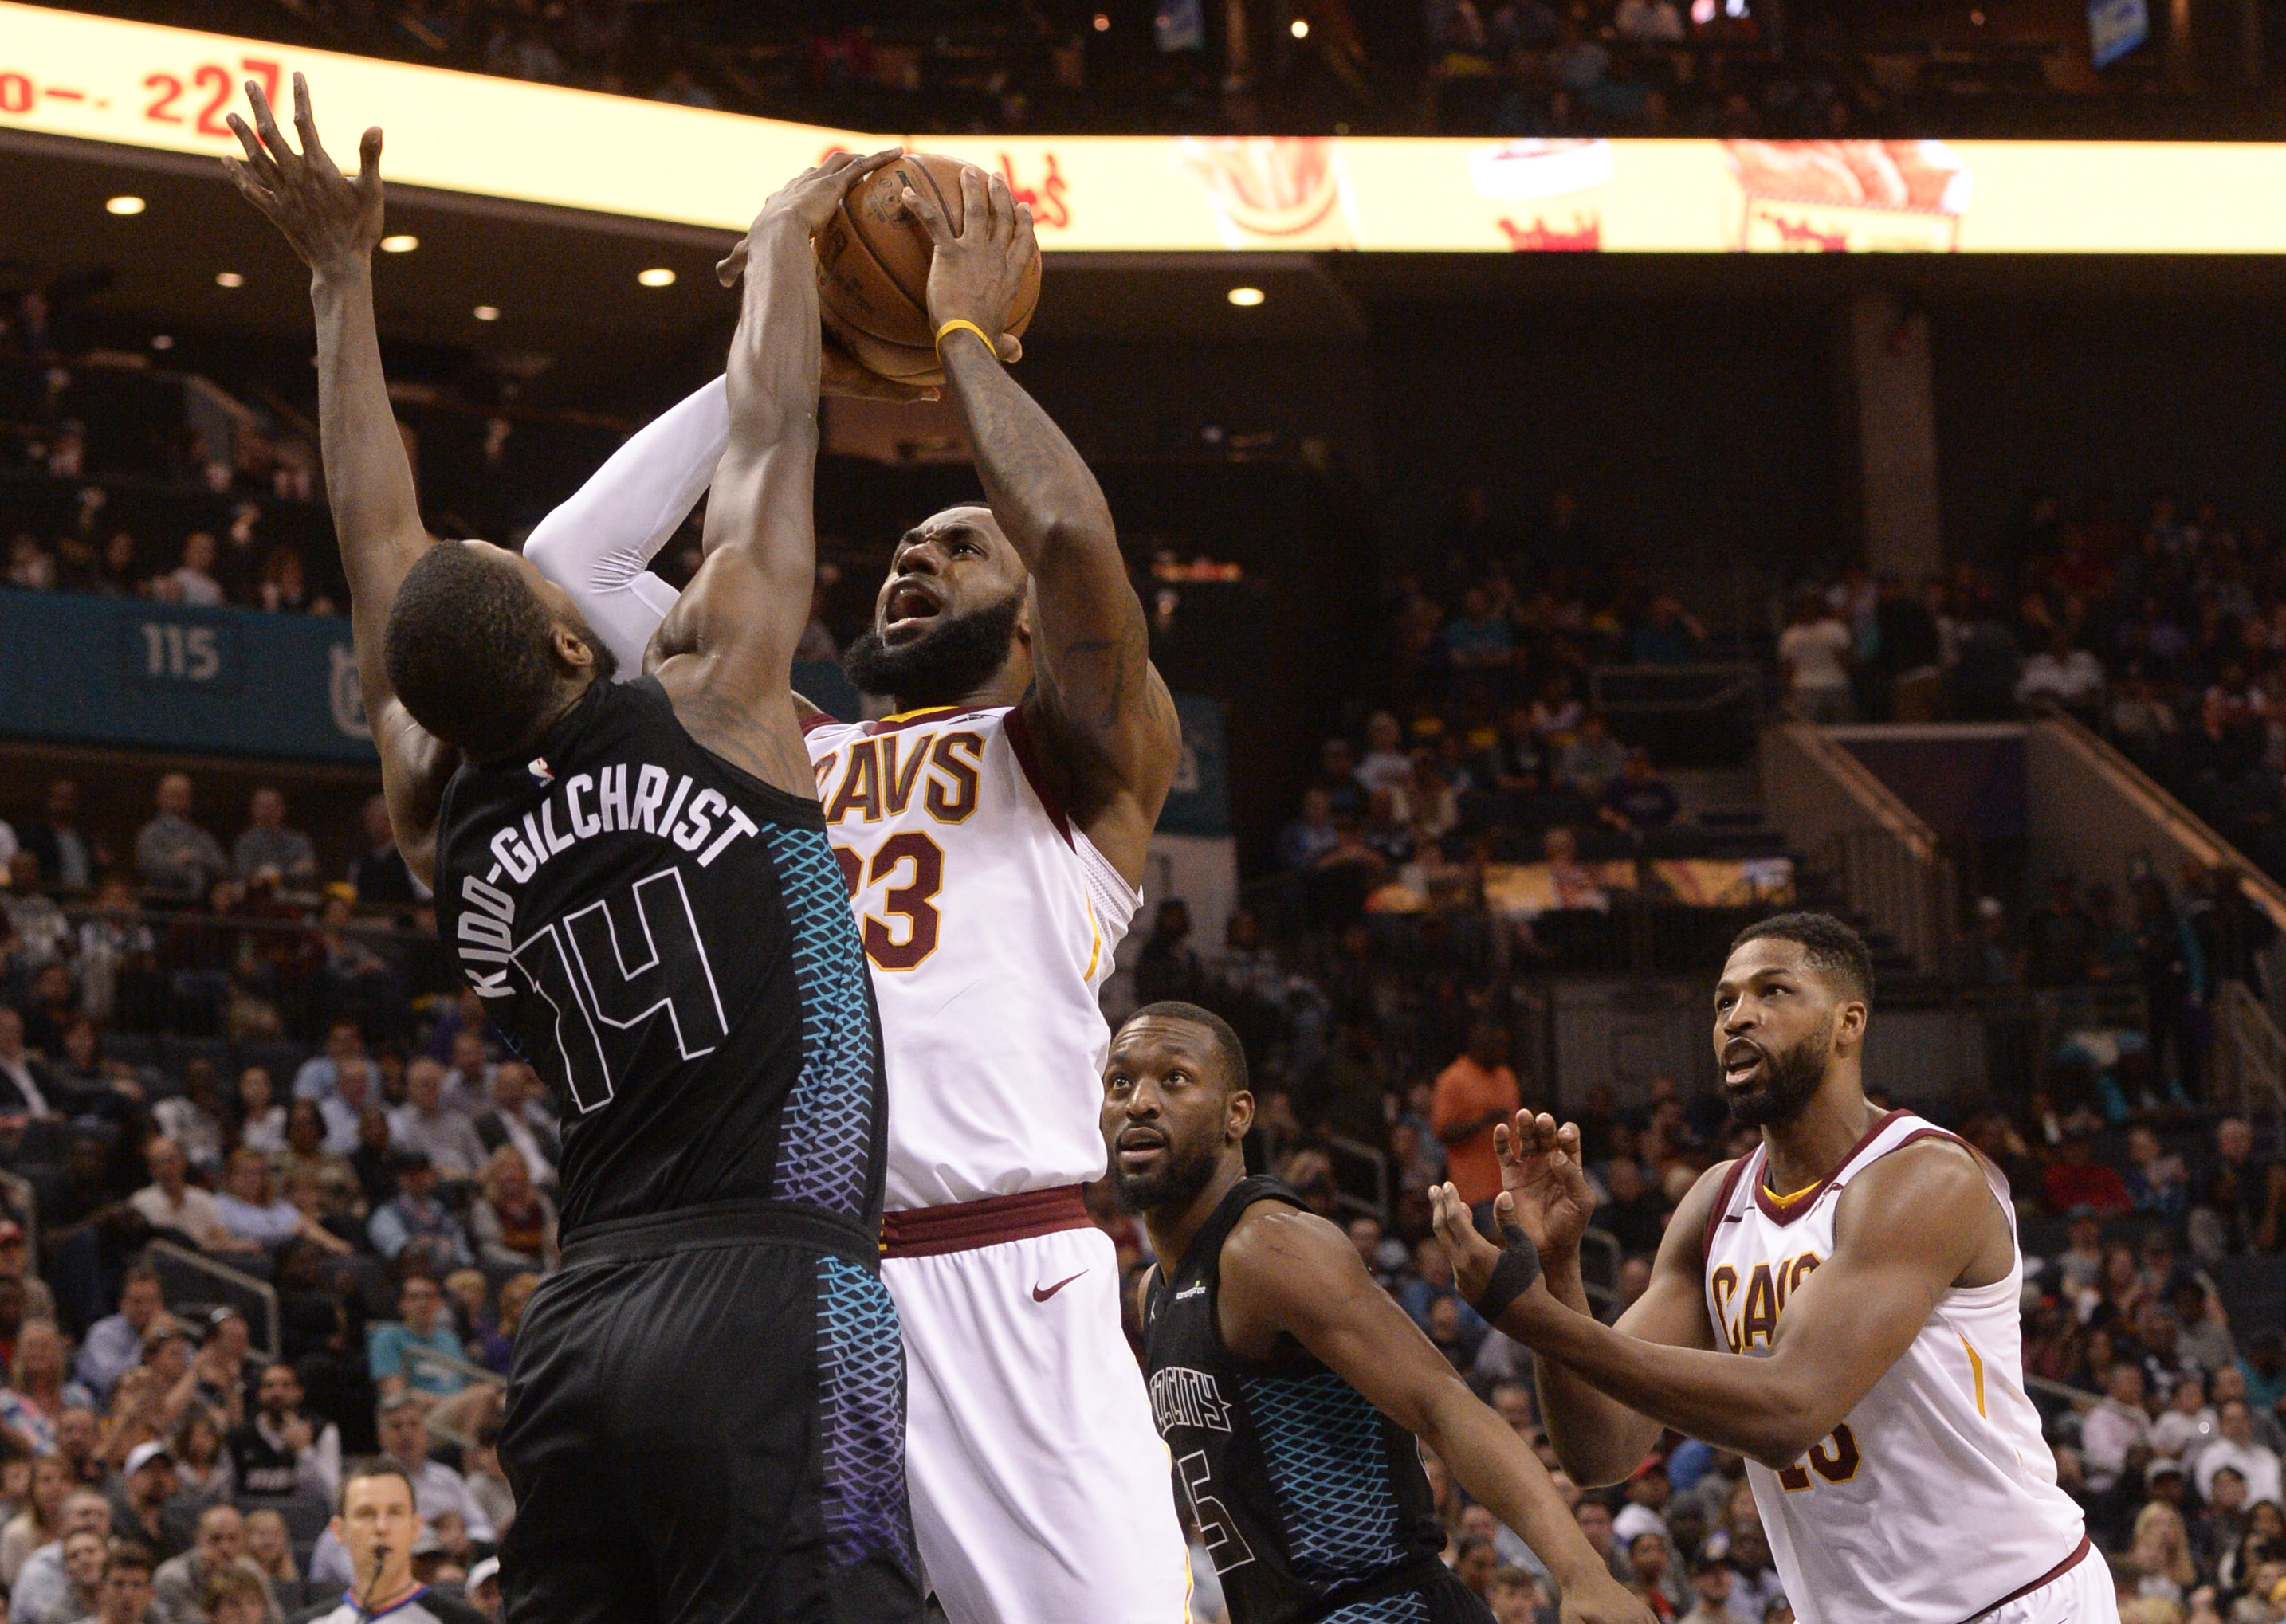 acheter en ligne 60bd4 88009 On n'arrête (vraiment) plus LeBron James… - NBA - Basket